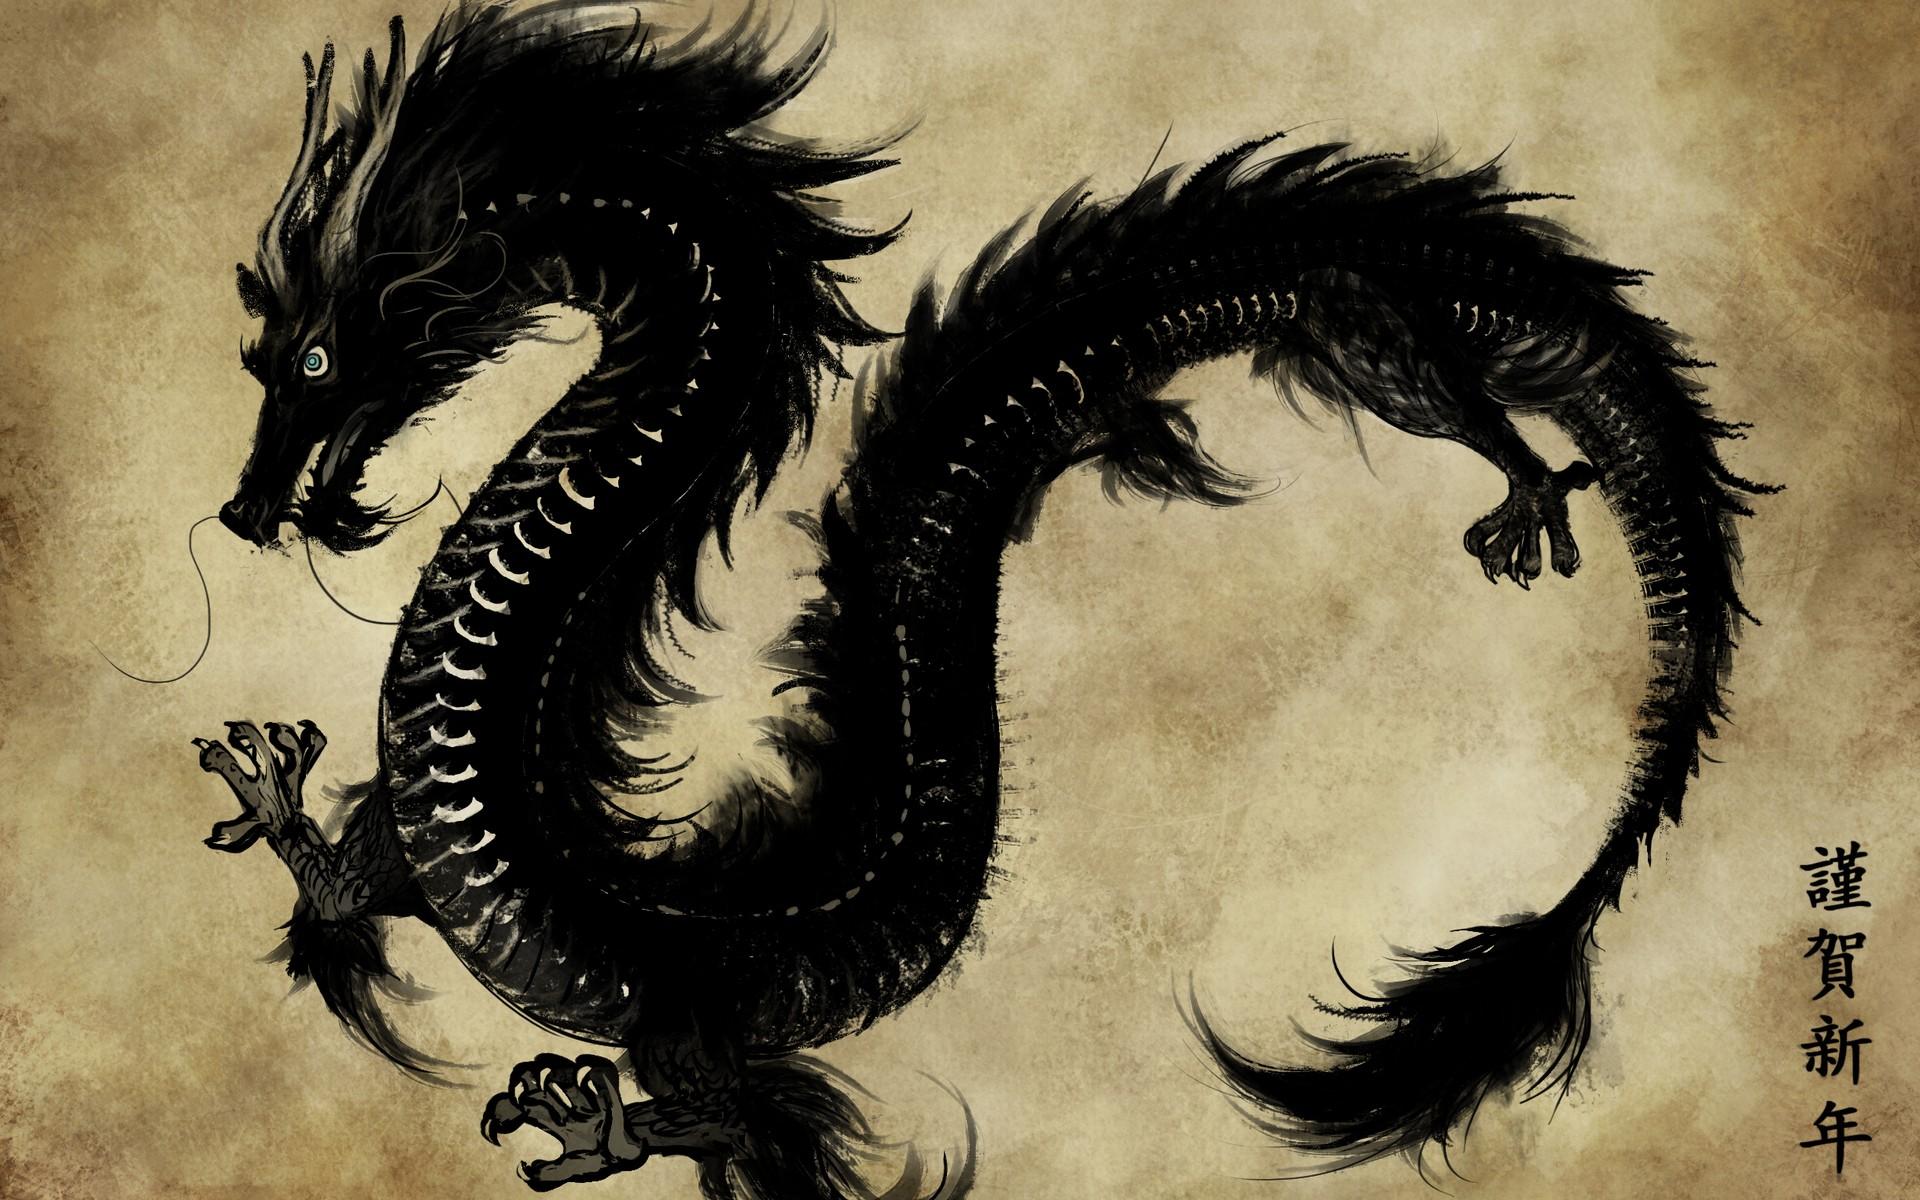 Dragon Ink Drawing Wallpapers Dragon Ink Drawing HD 1920x1200